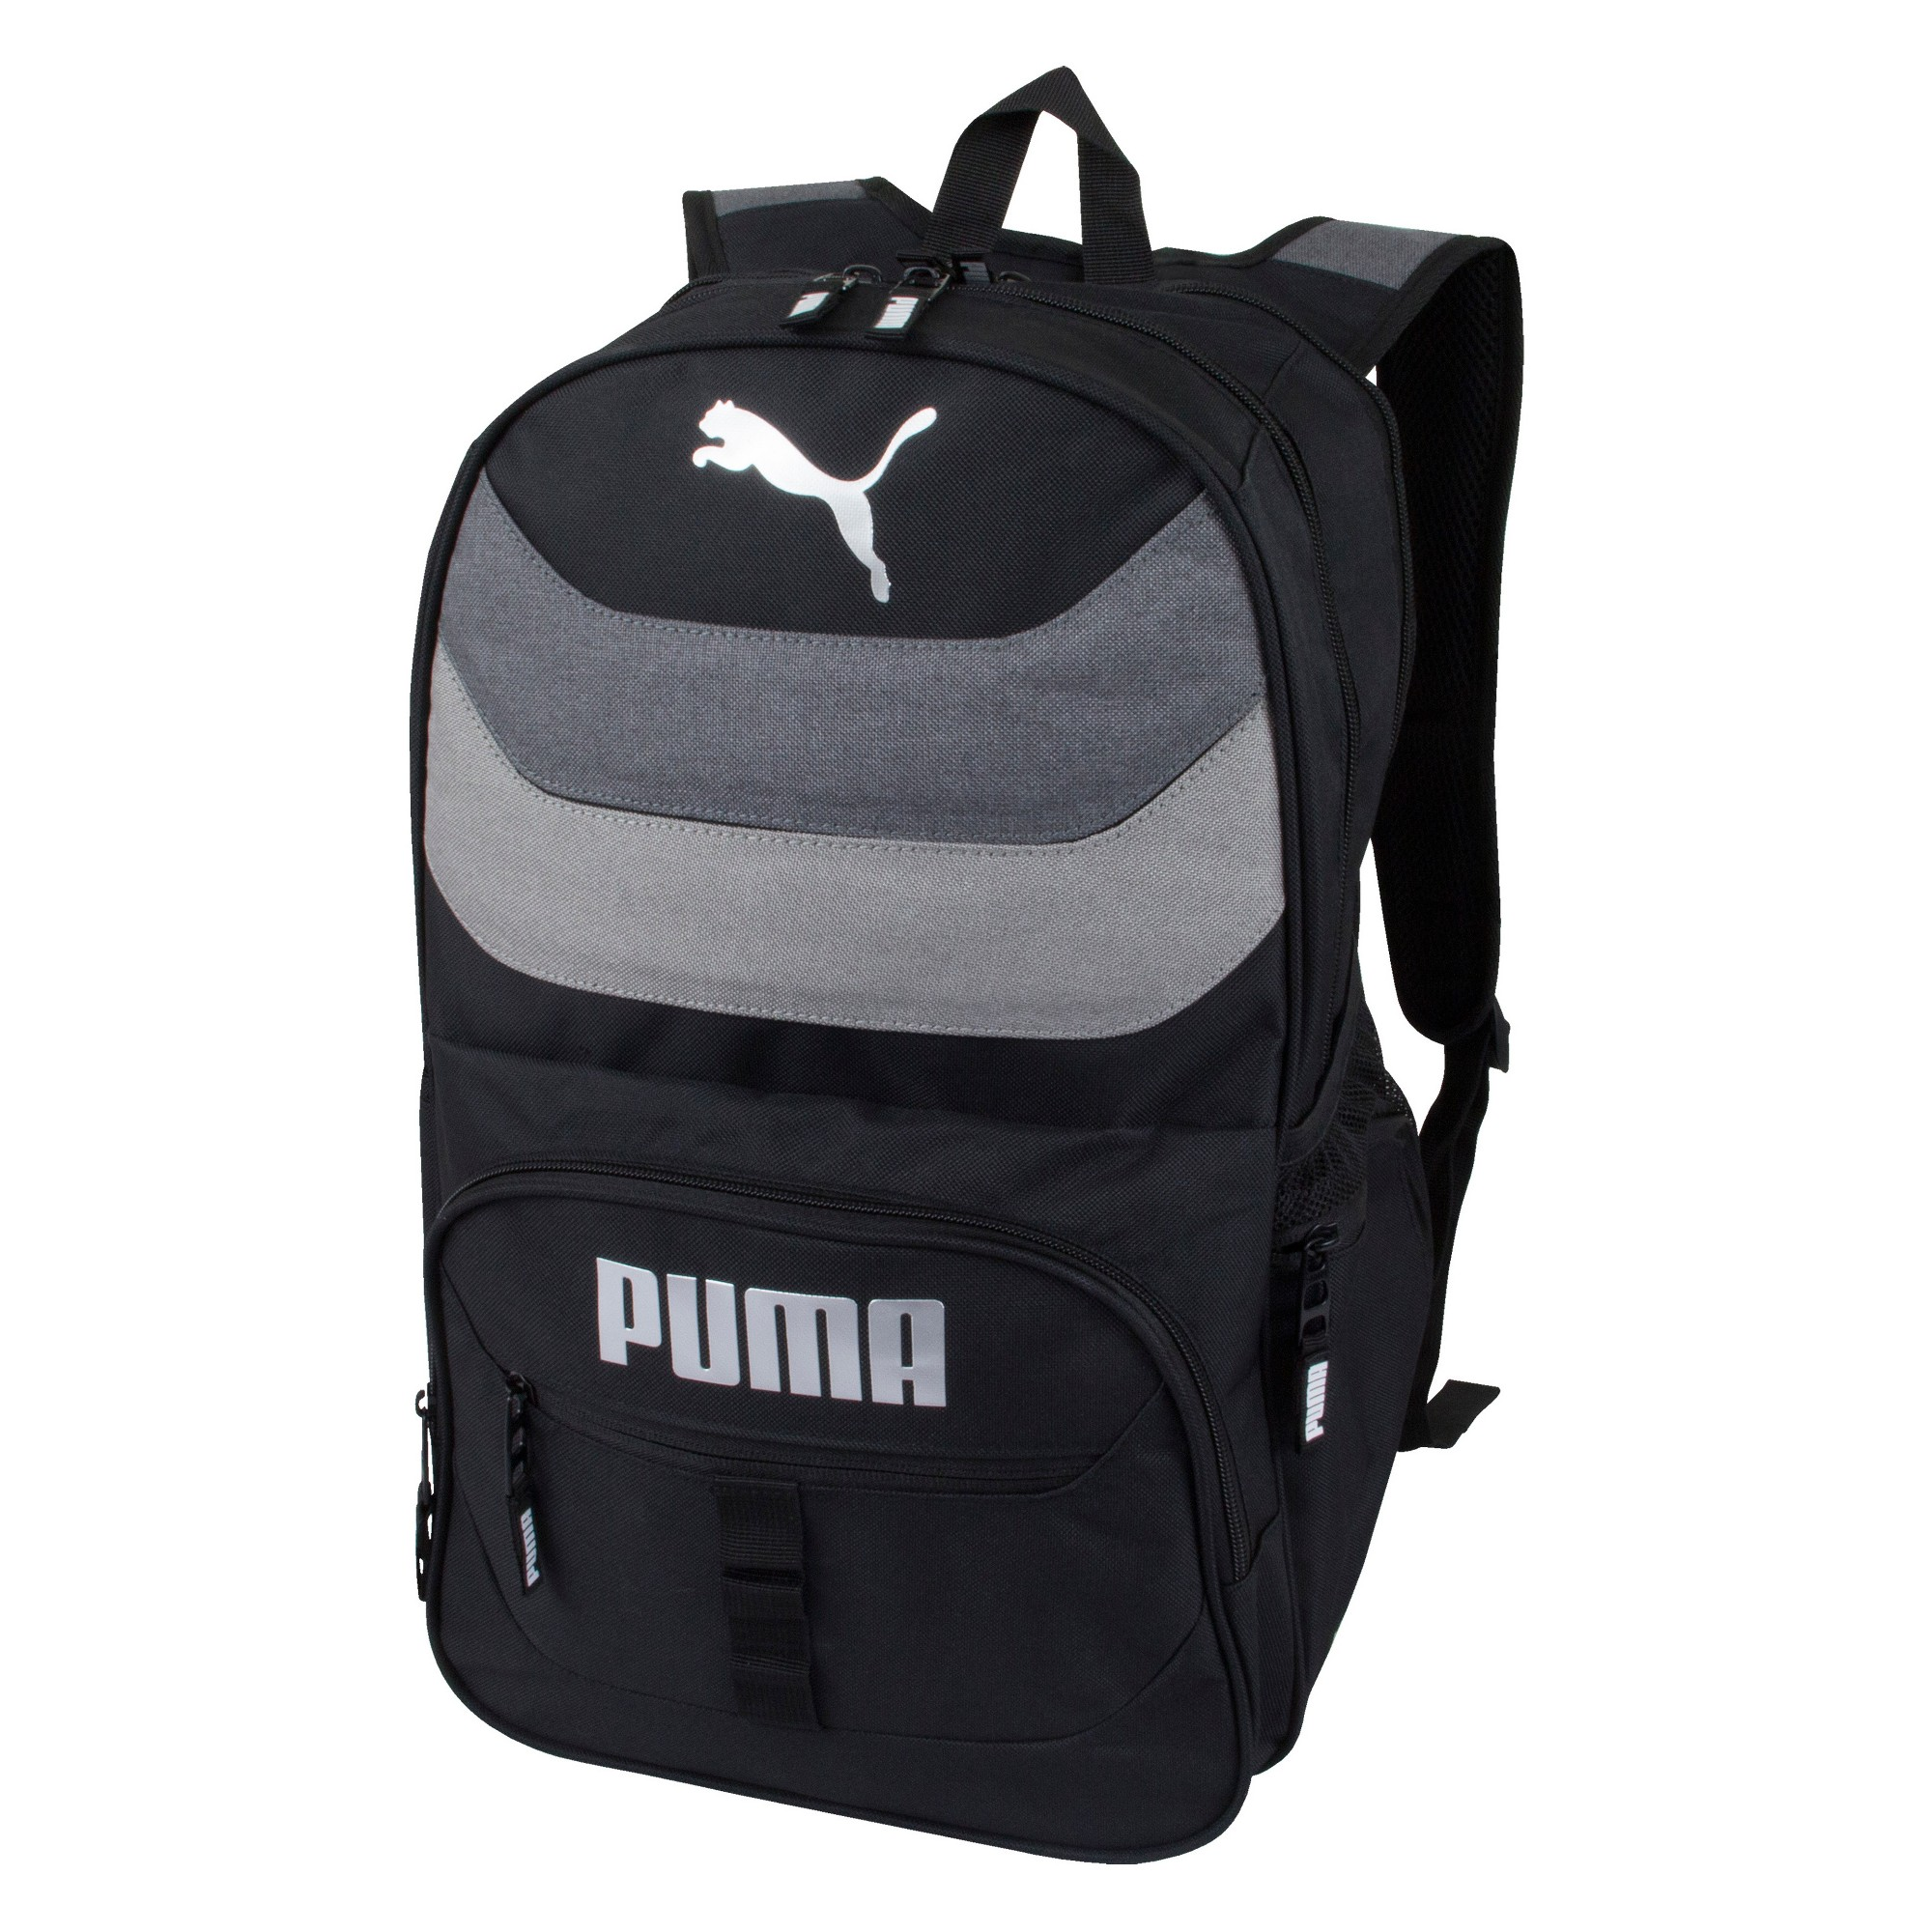 puma backpack target